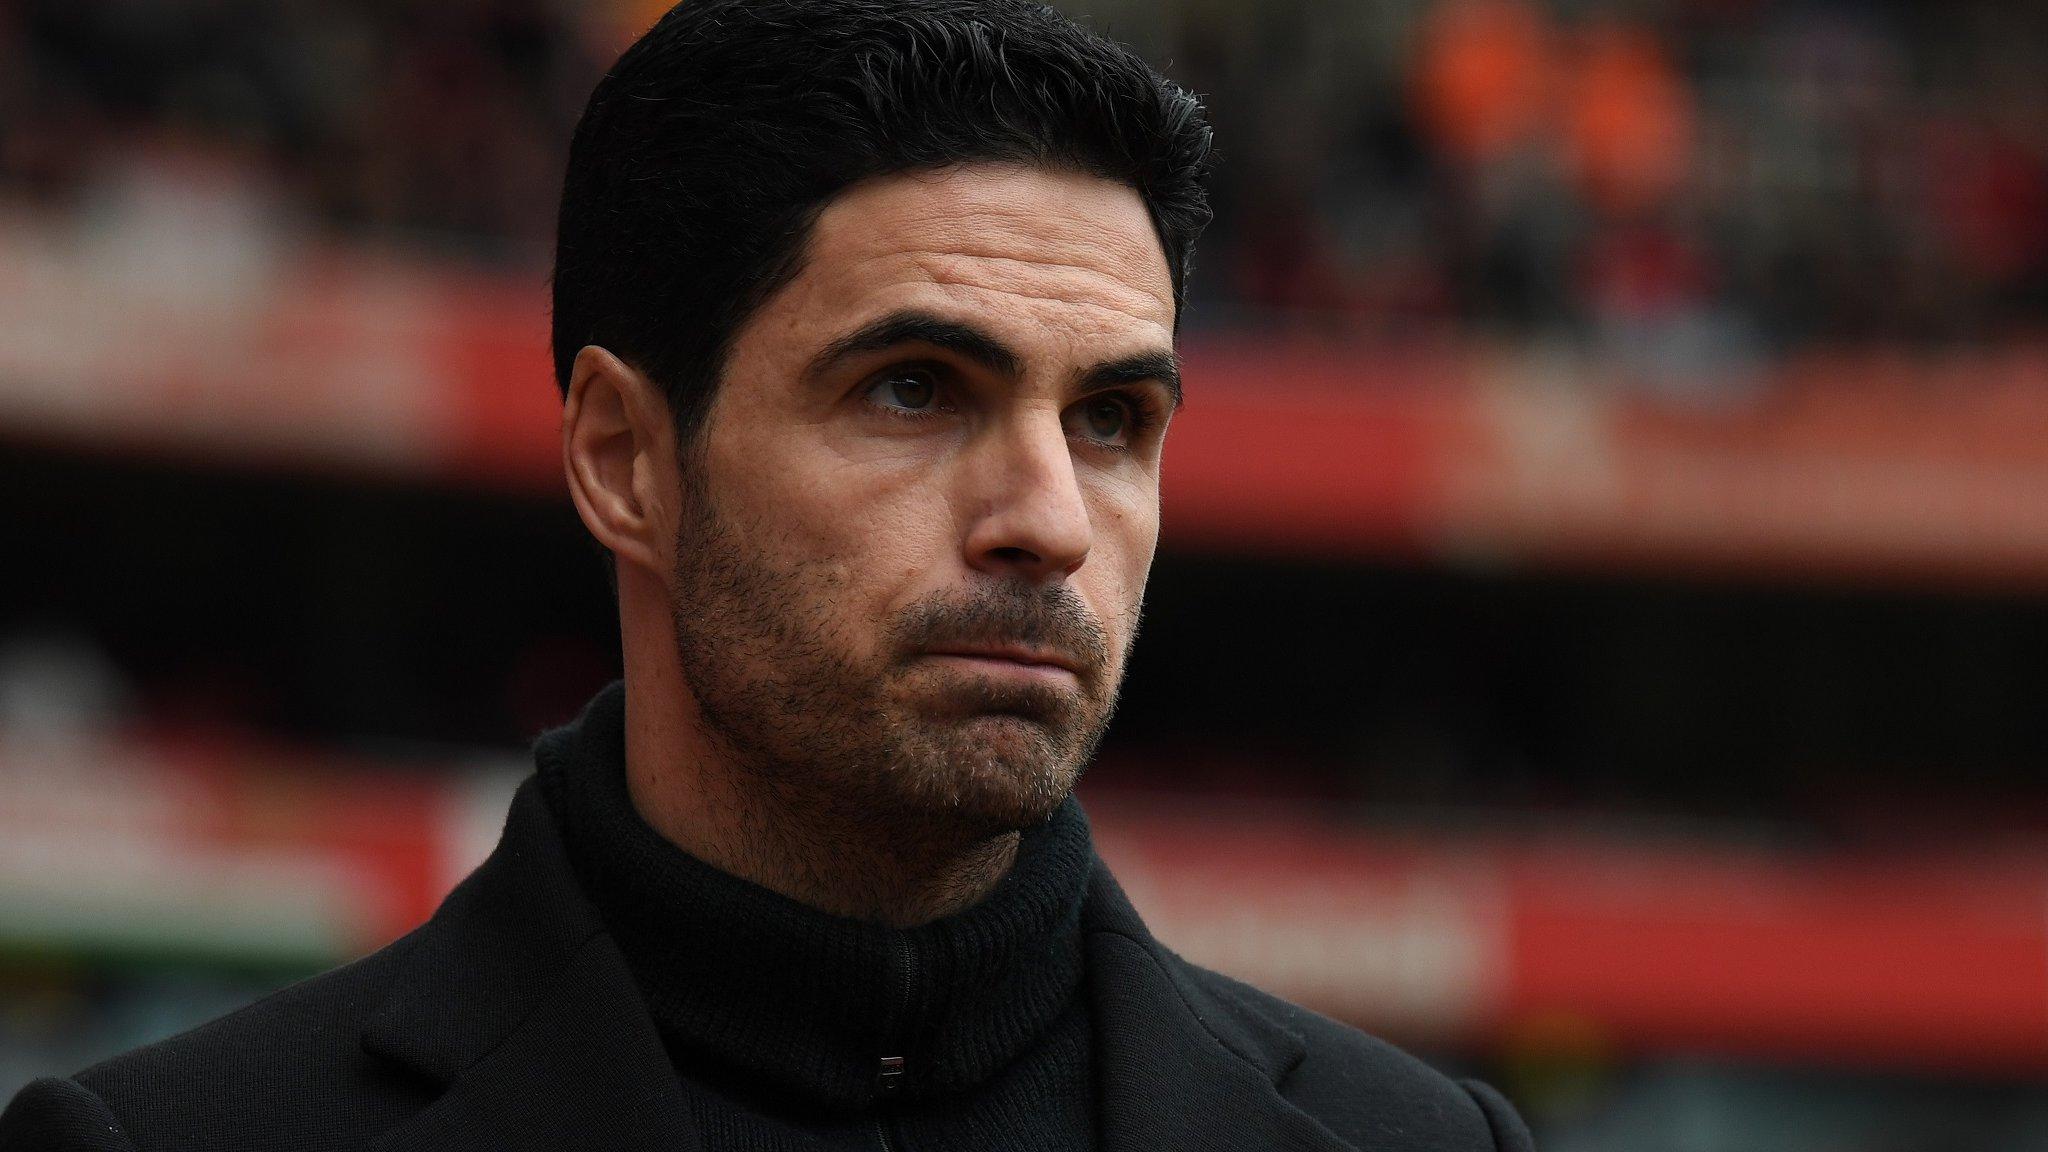 Mikel Arteta Arsenal Manager Test Positive For Coronavirus See How E Happun Bbc News Pidgin